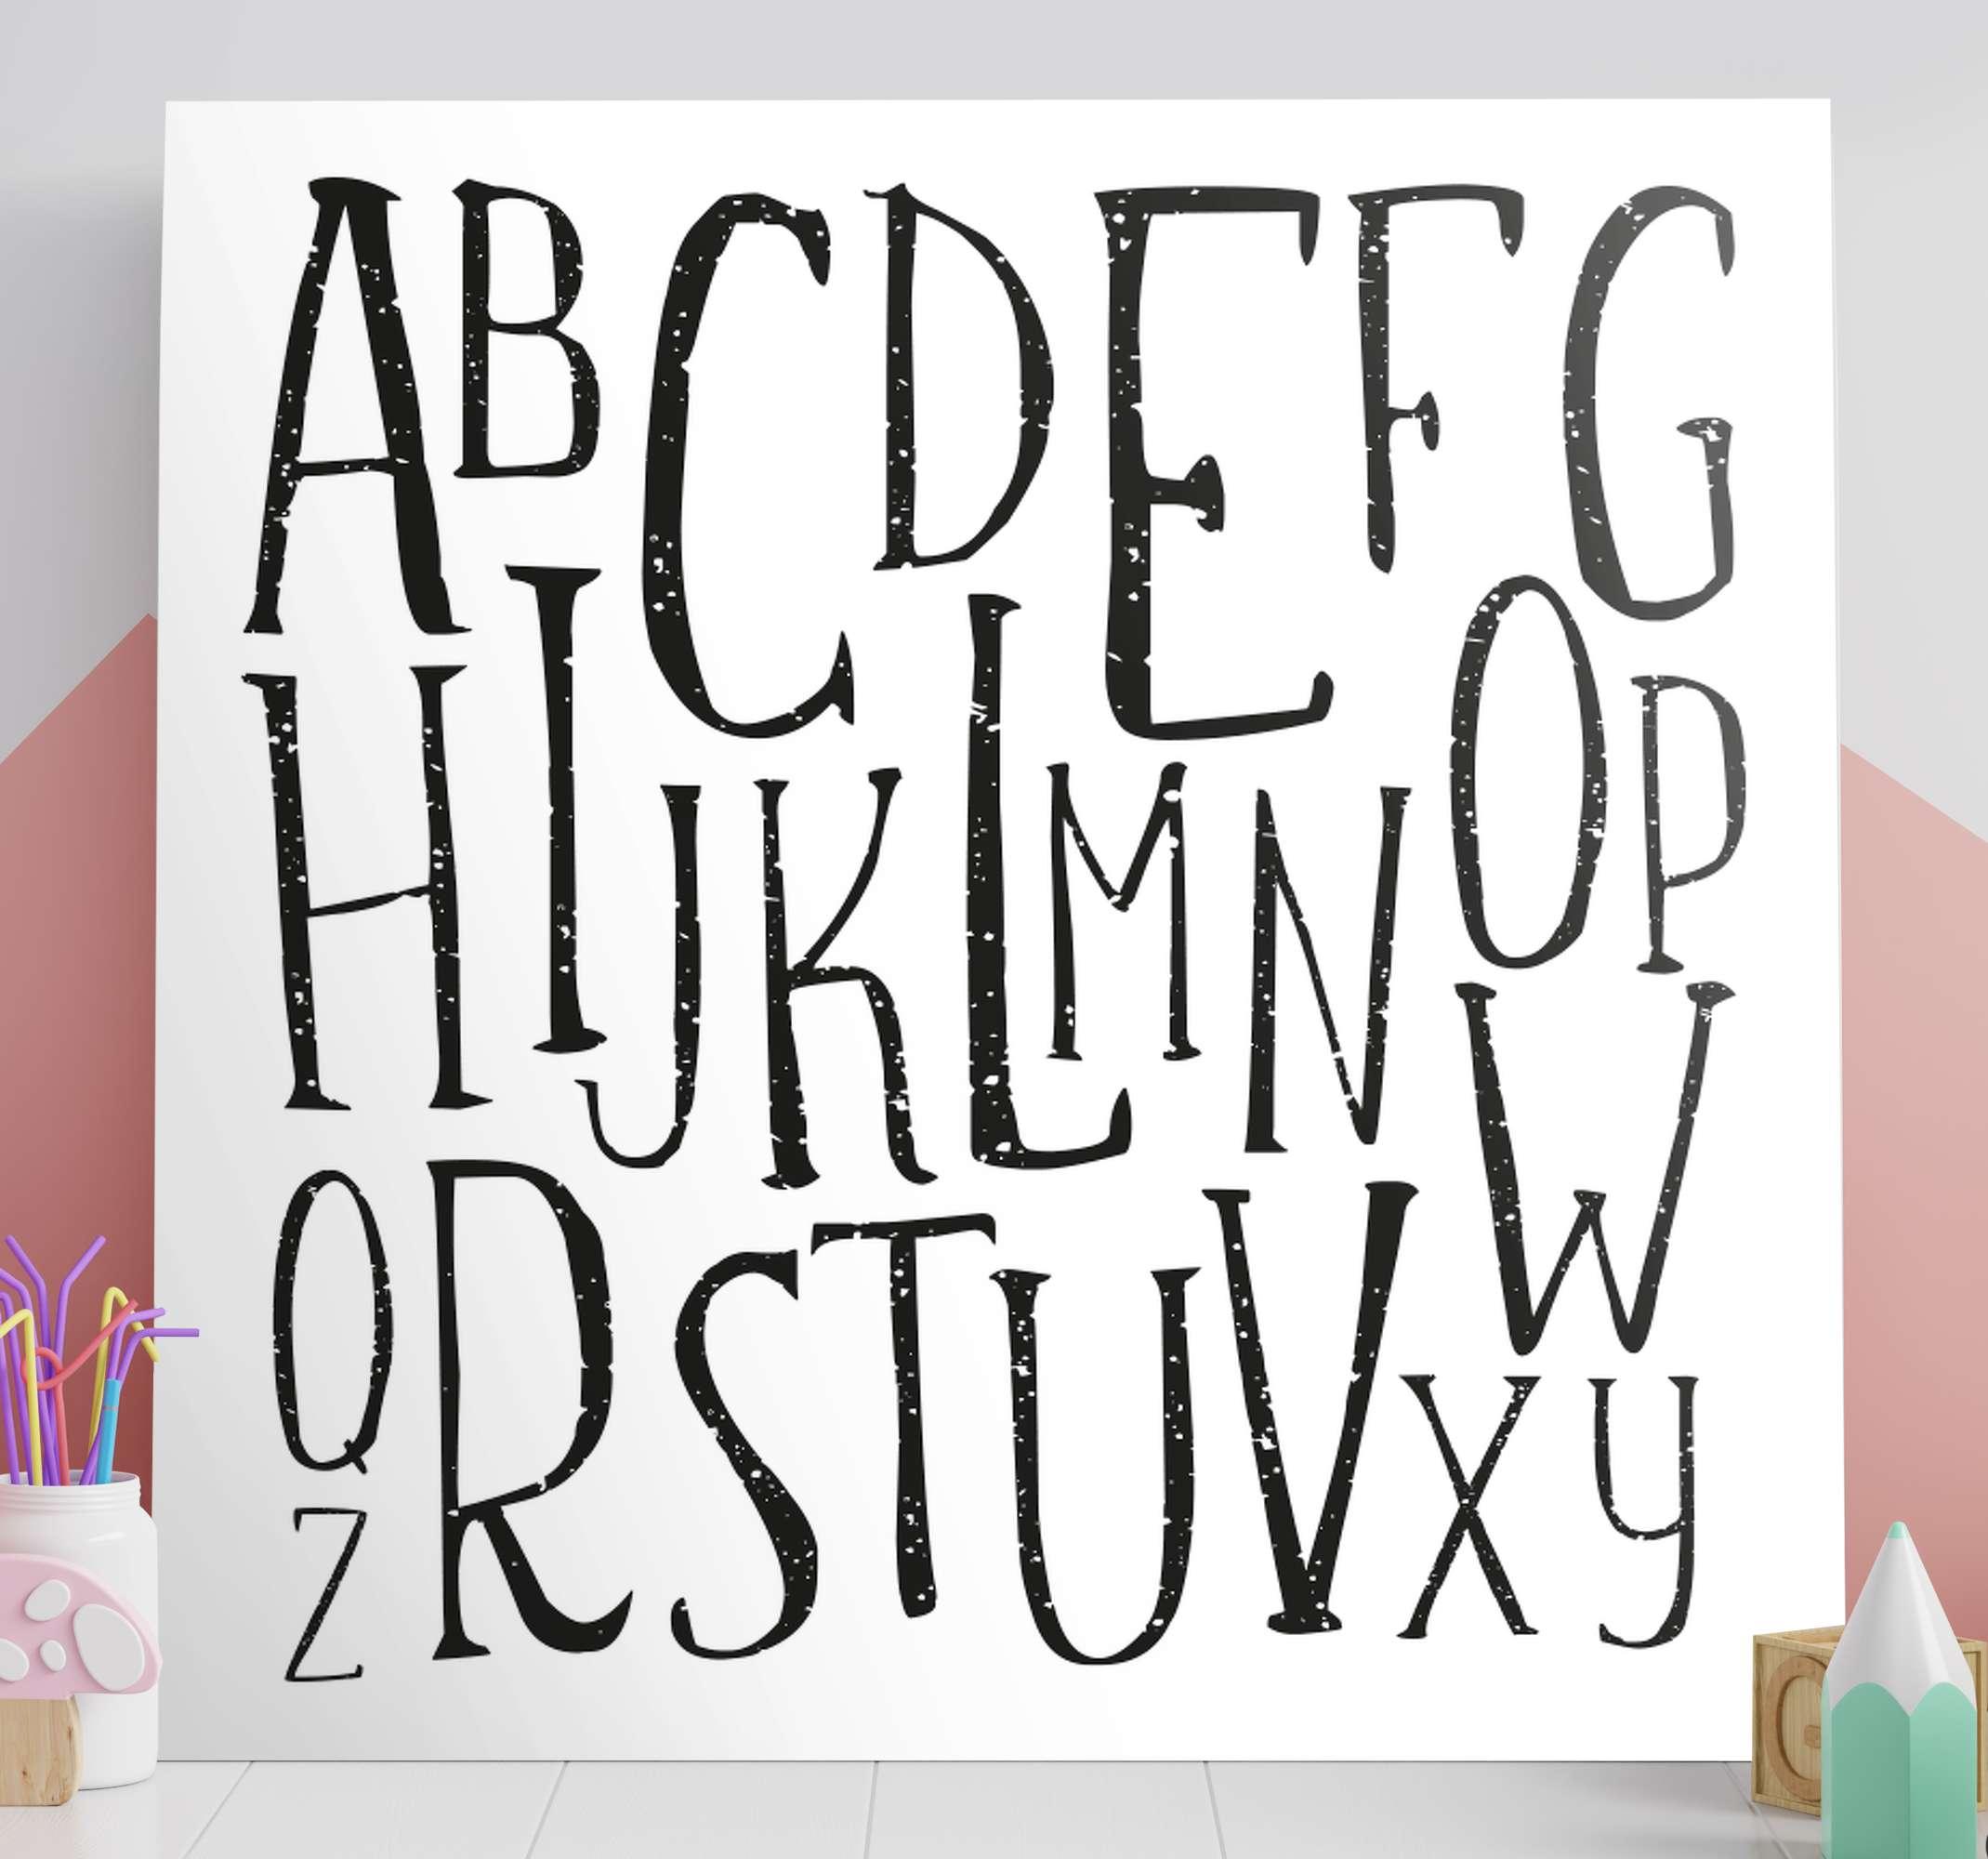 TenStickers. 字母信帆布墙艺术. 字母帆布打印-可以在儿童空间,游戏室,托儿所等地方装饰。它以高质量的面漆印刷,并且不会褪色。